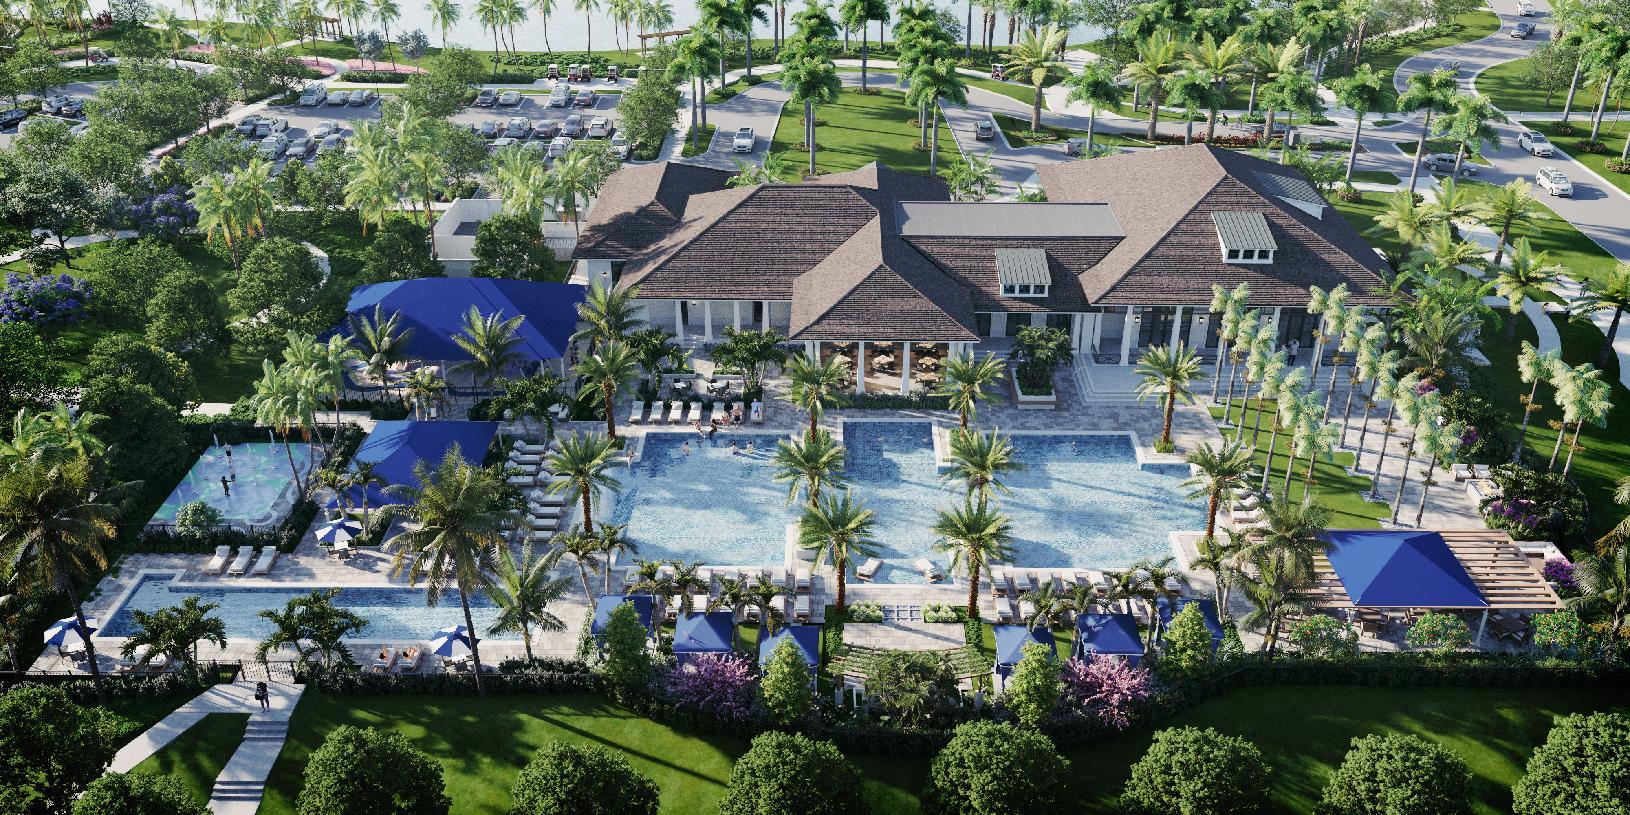 Windgate residents will enjoy Avenir's future resort-style amenities